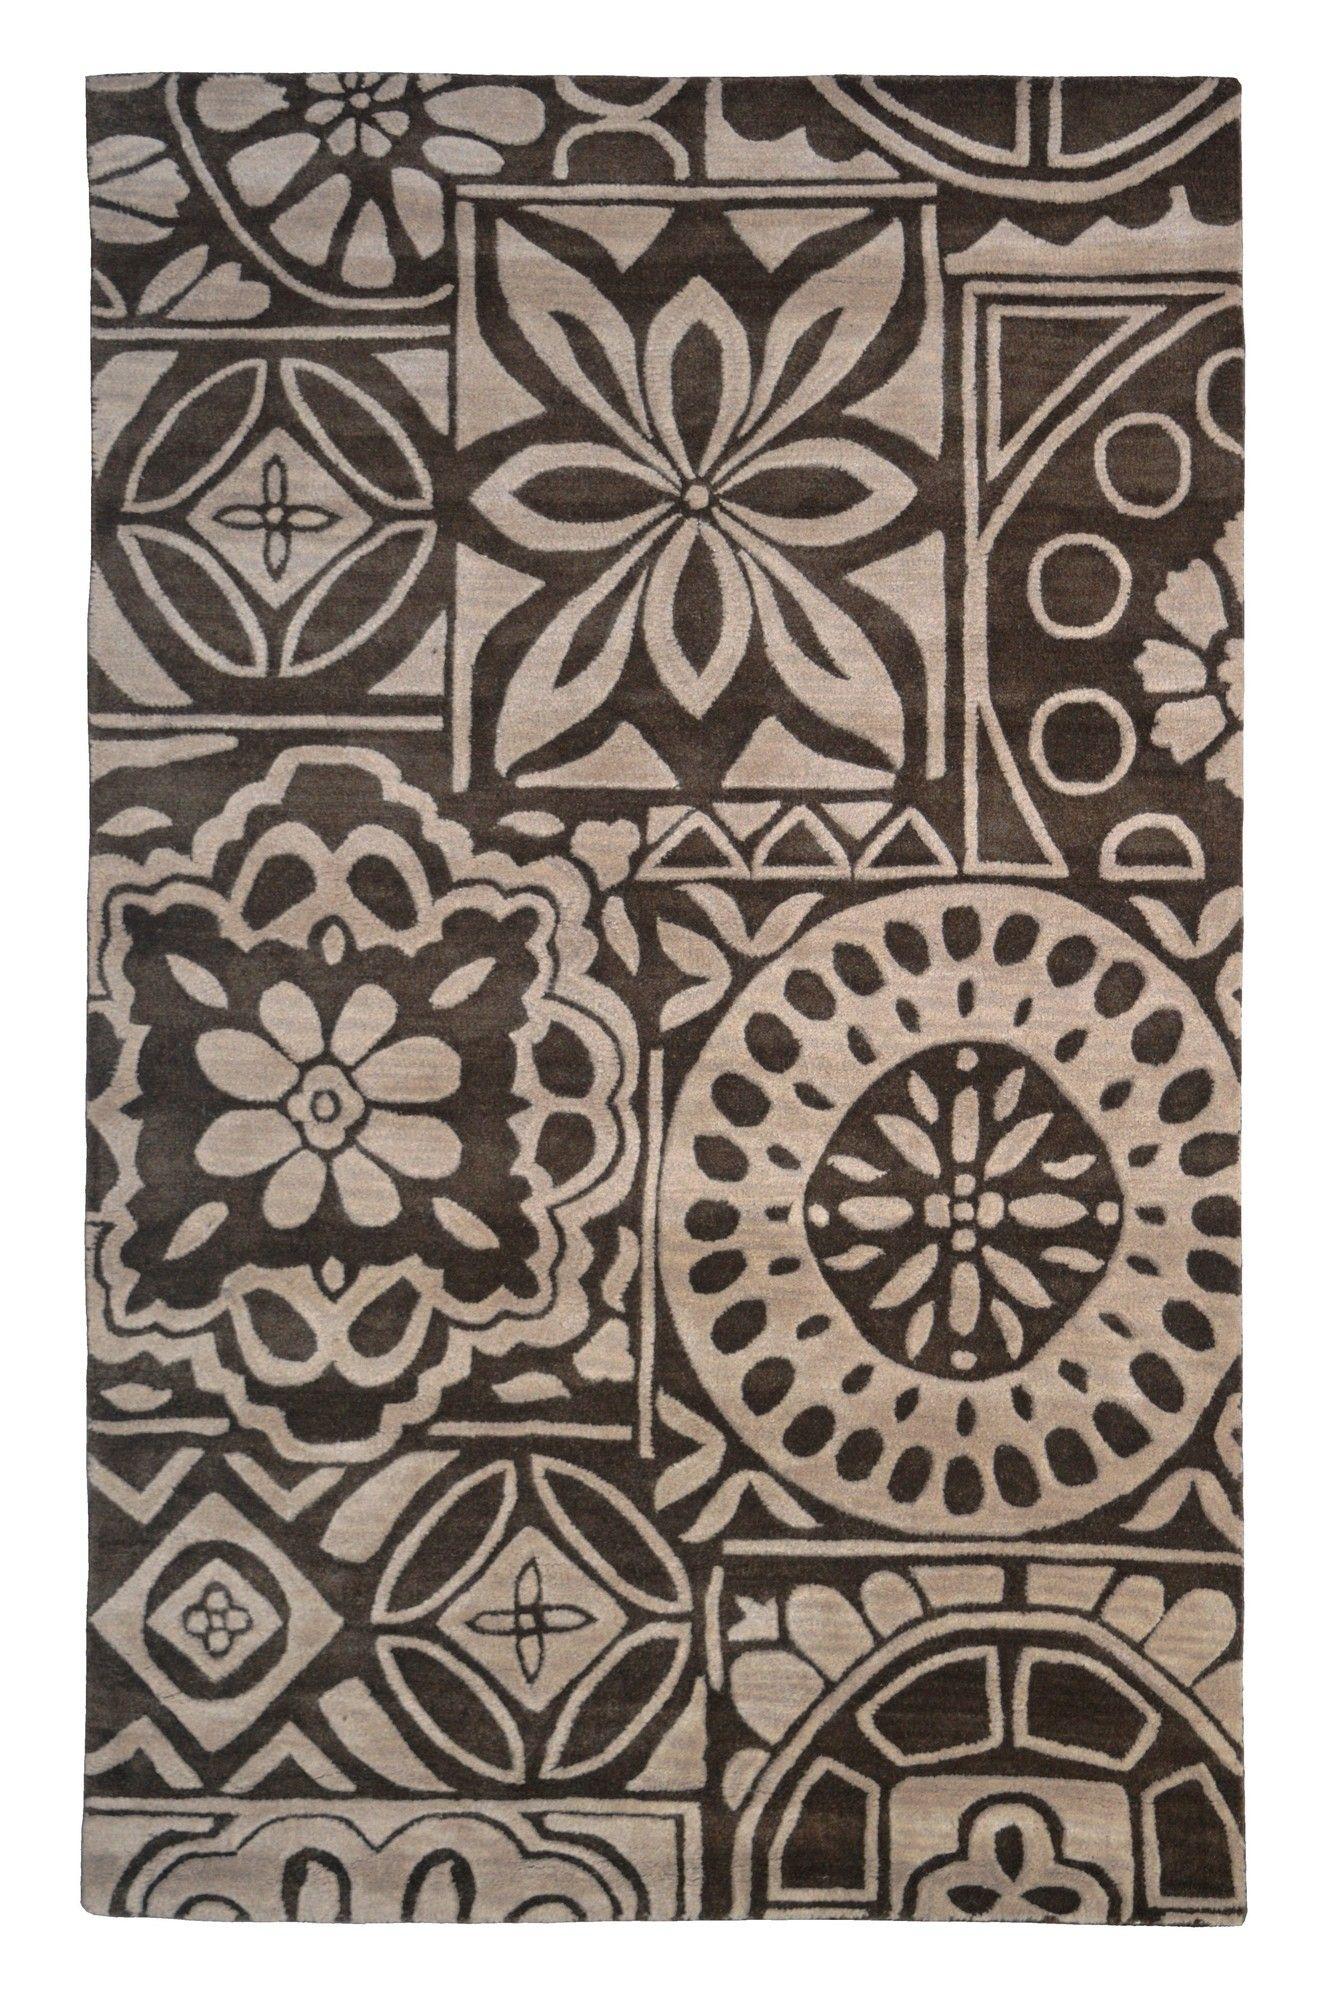 Wool Floral Hand Tufted Brown Beige Area Rug Wool Area Rugs Beige Area Rugs Rugs